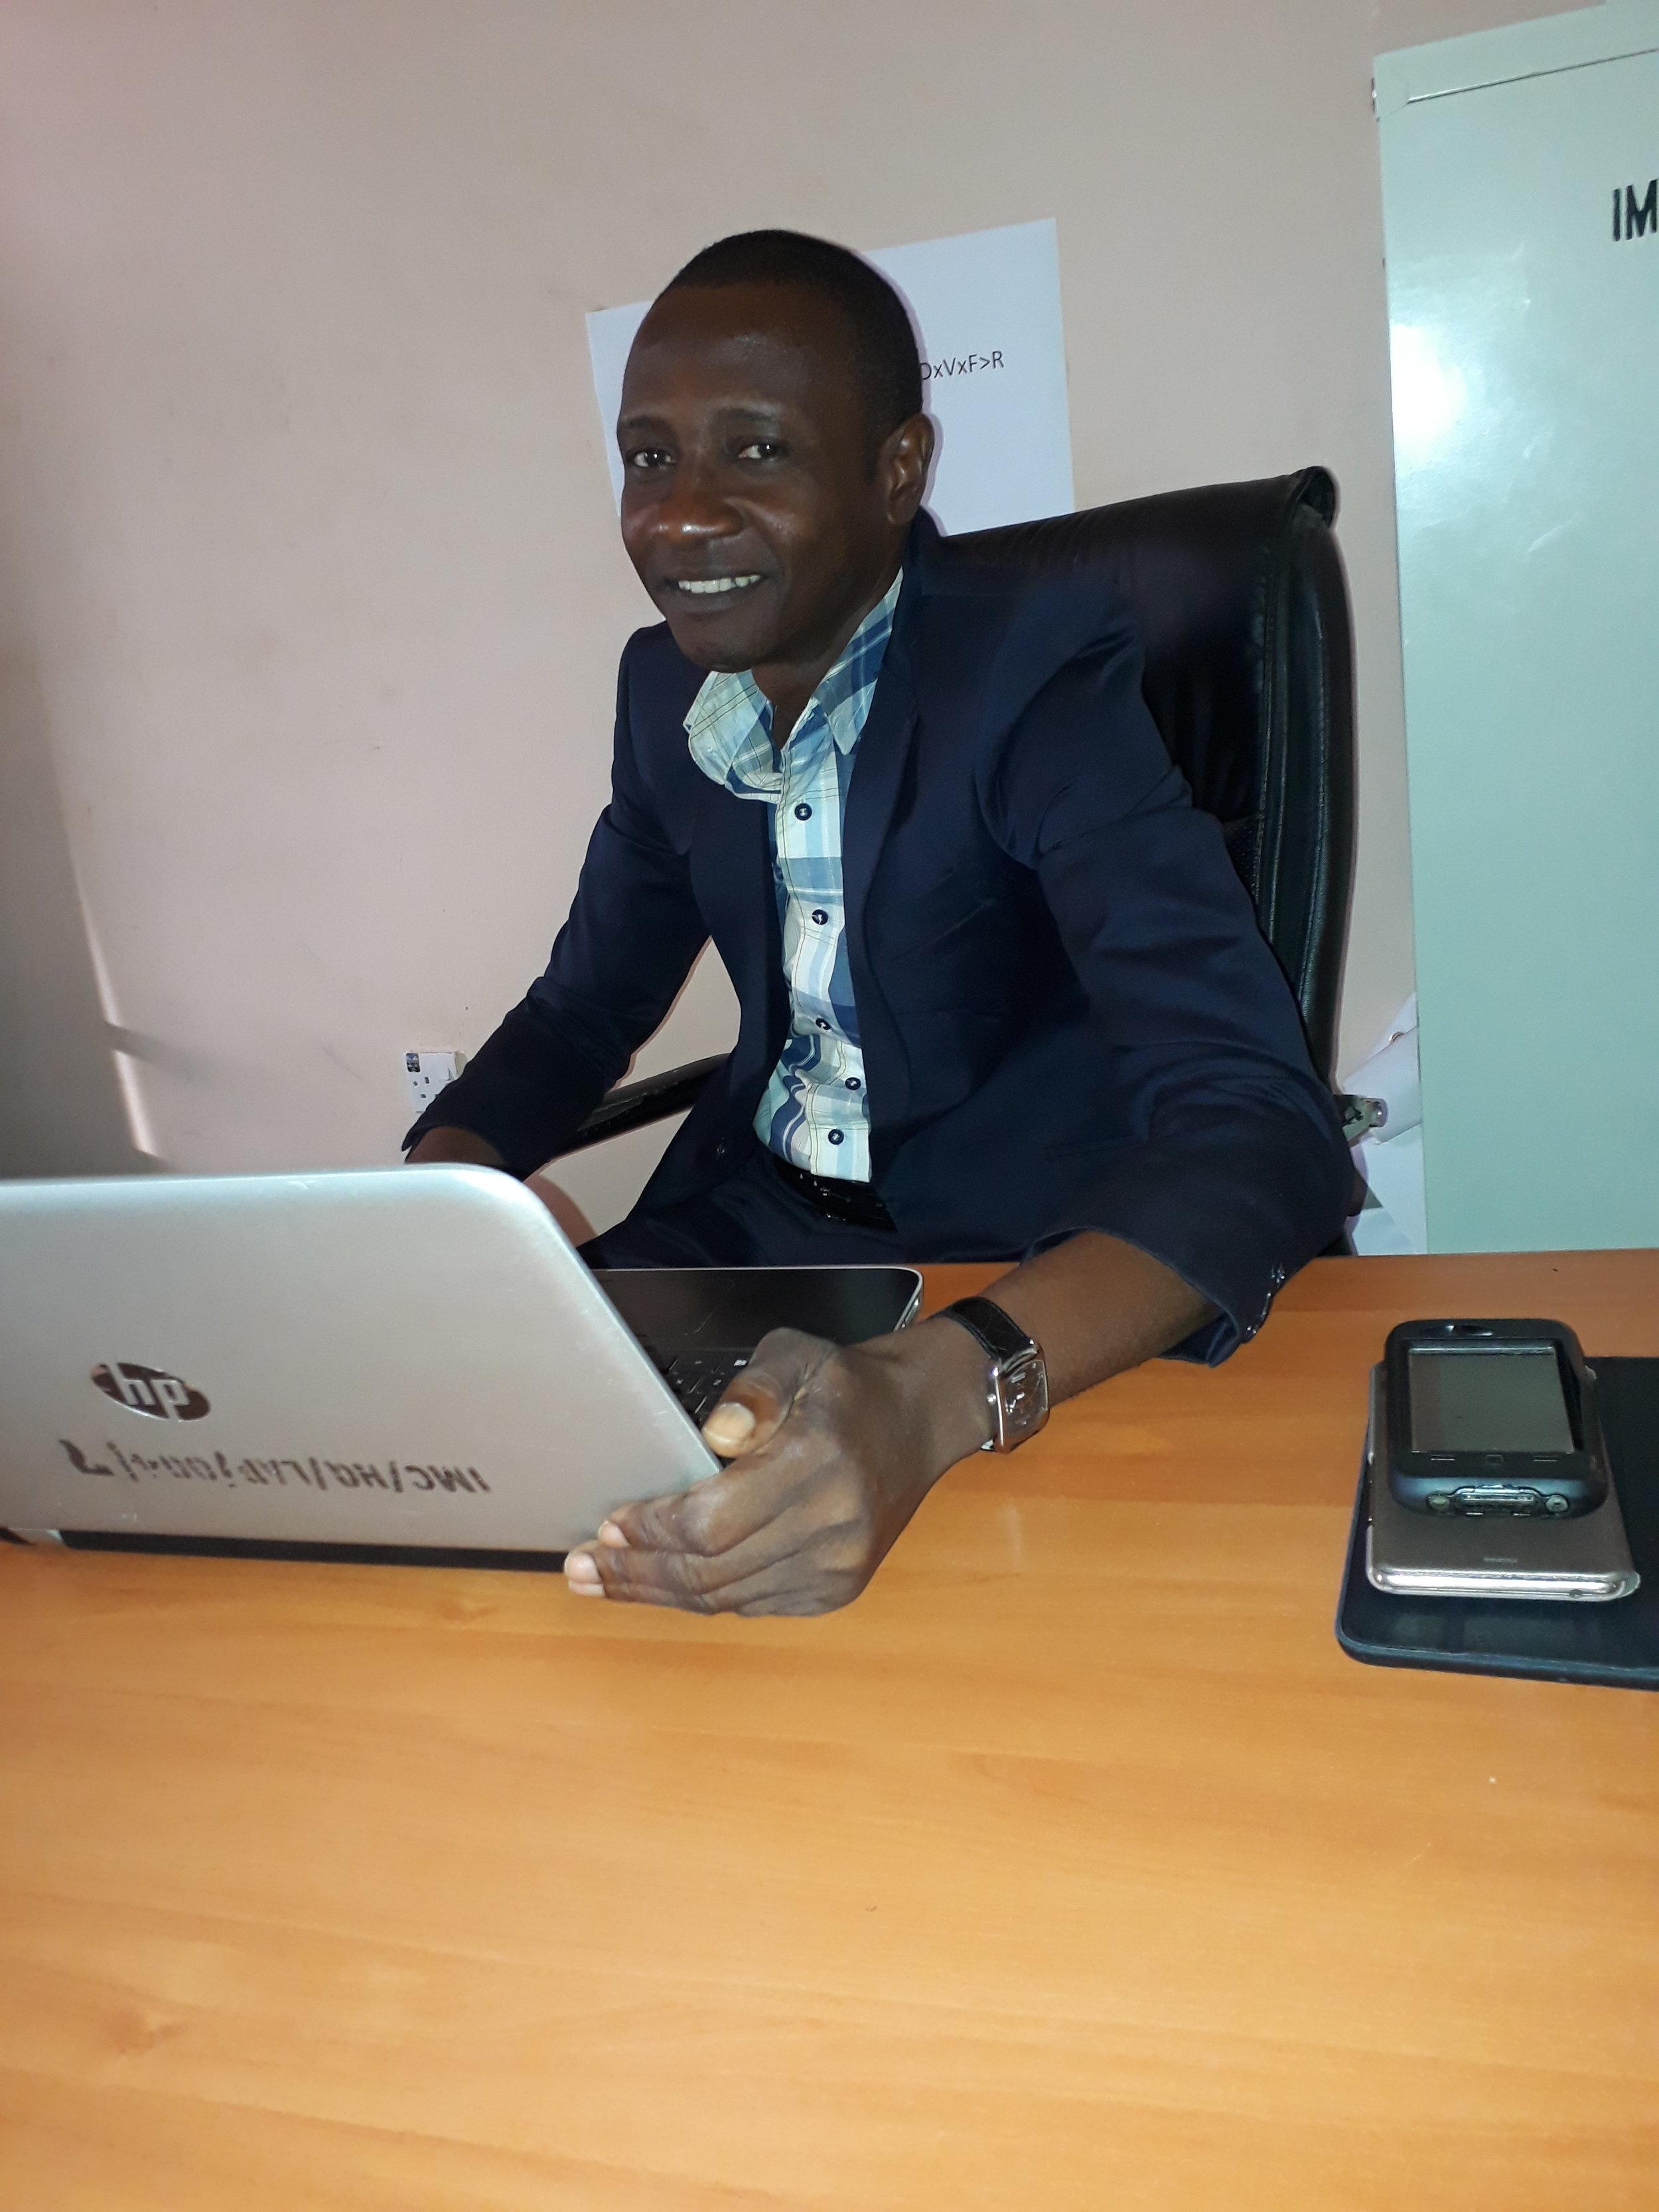 Charles Ndukwe, Program Officer, IMC. Mobile number:0803-310-9660 or 0802-232-6666. Email: ndukwecharles@gmail.com/chizond@yahoo.com